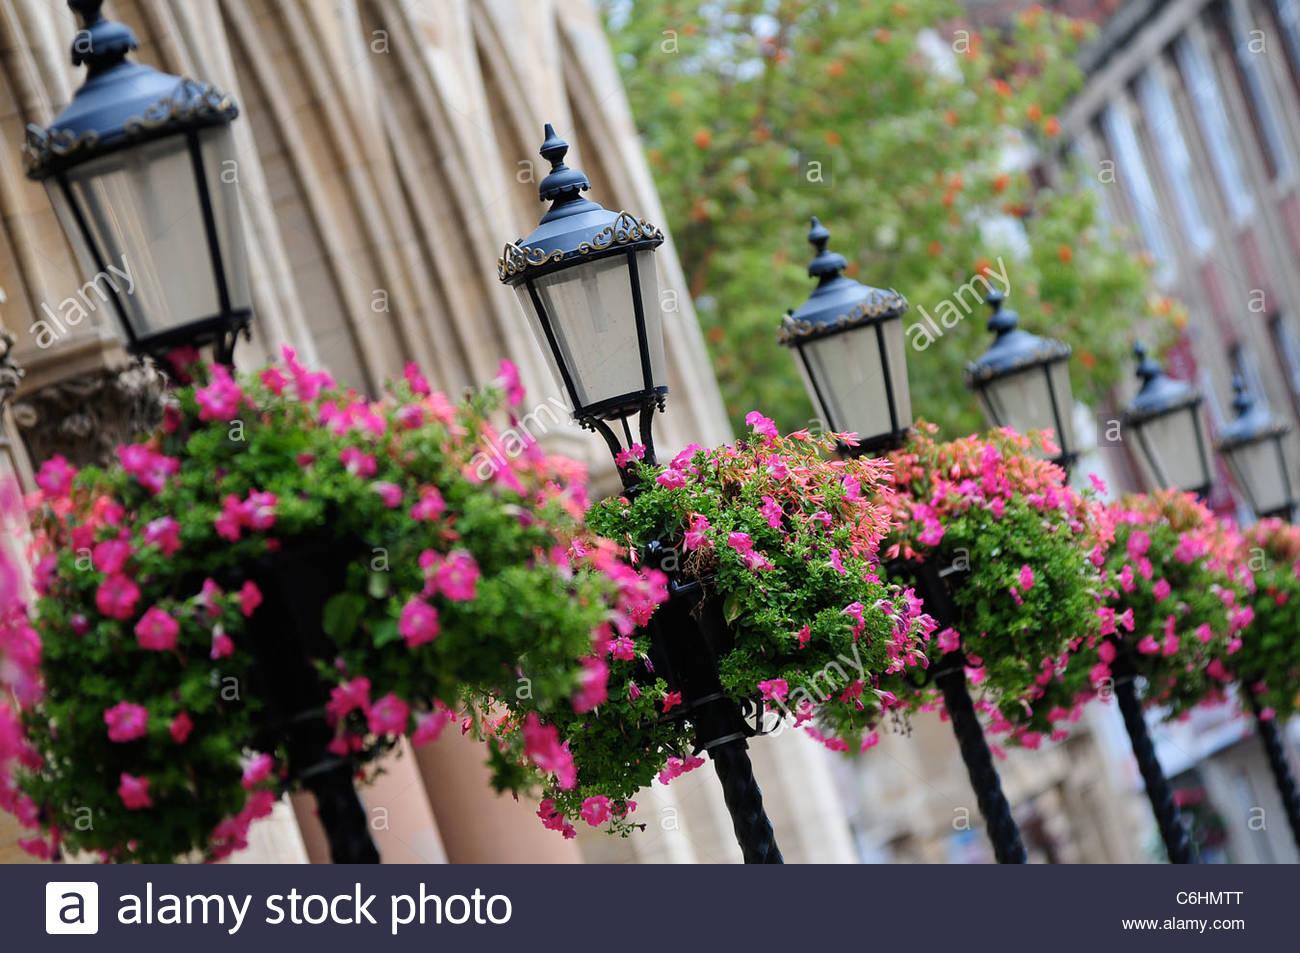 Hanging Baskets, Street Lamps. - Stock Image